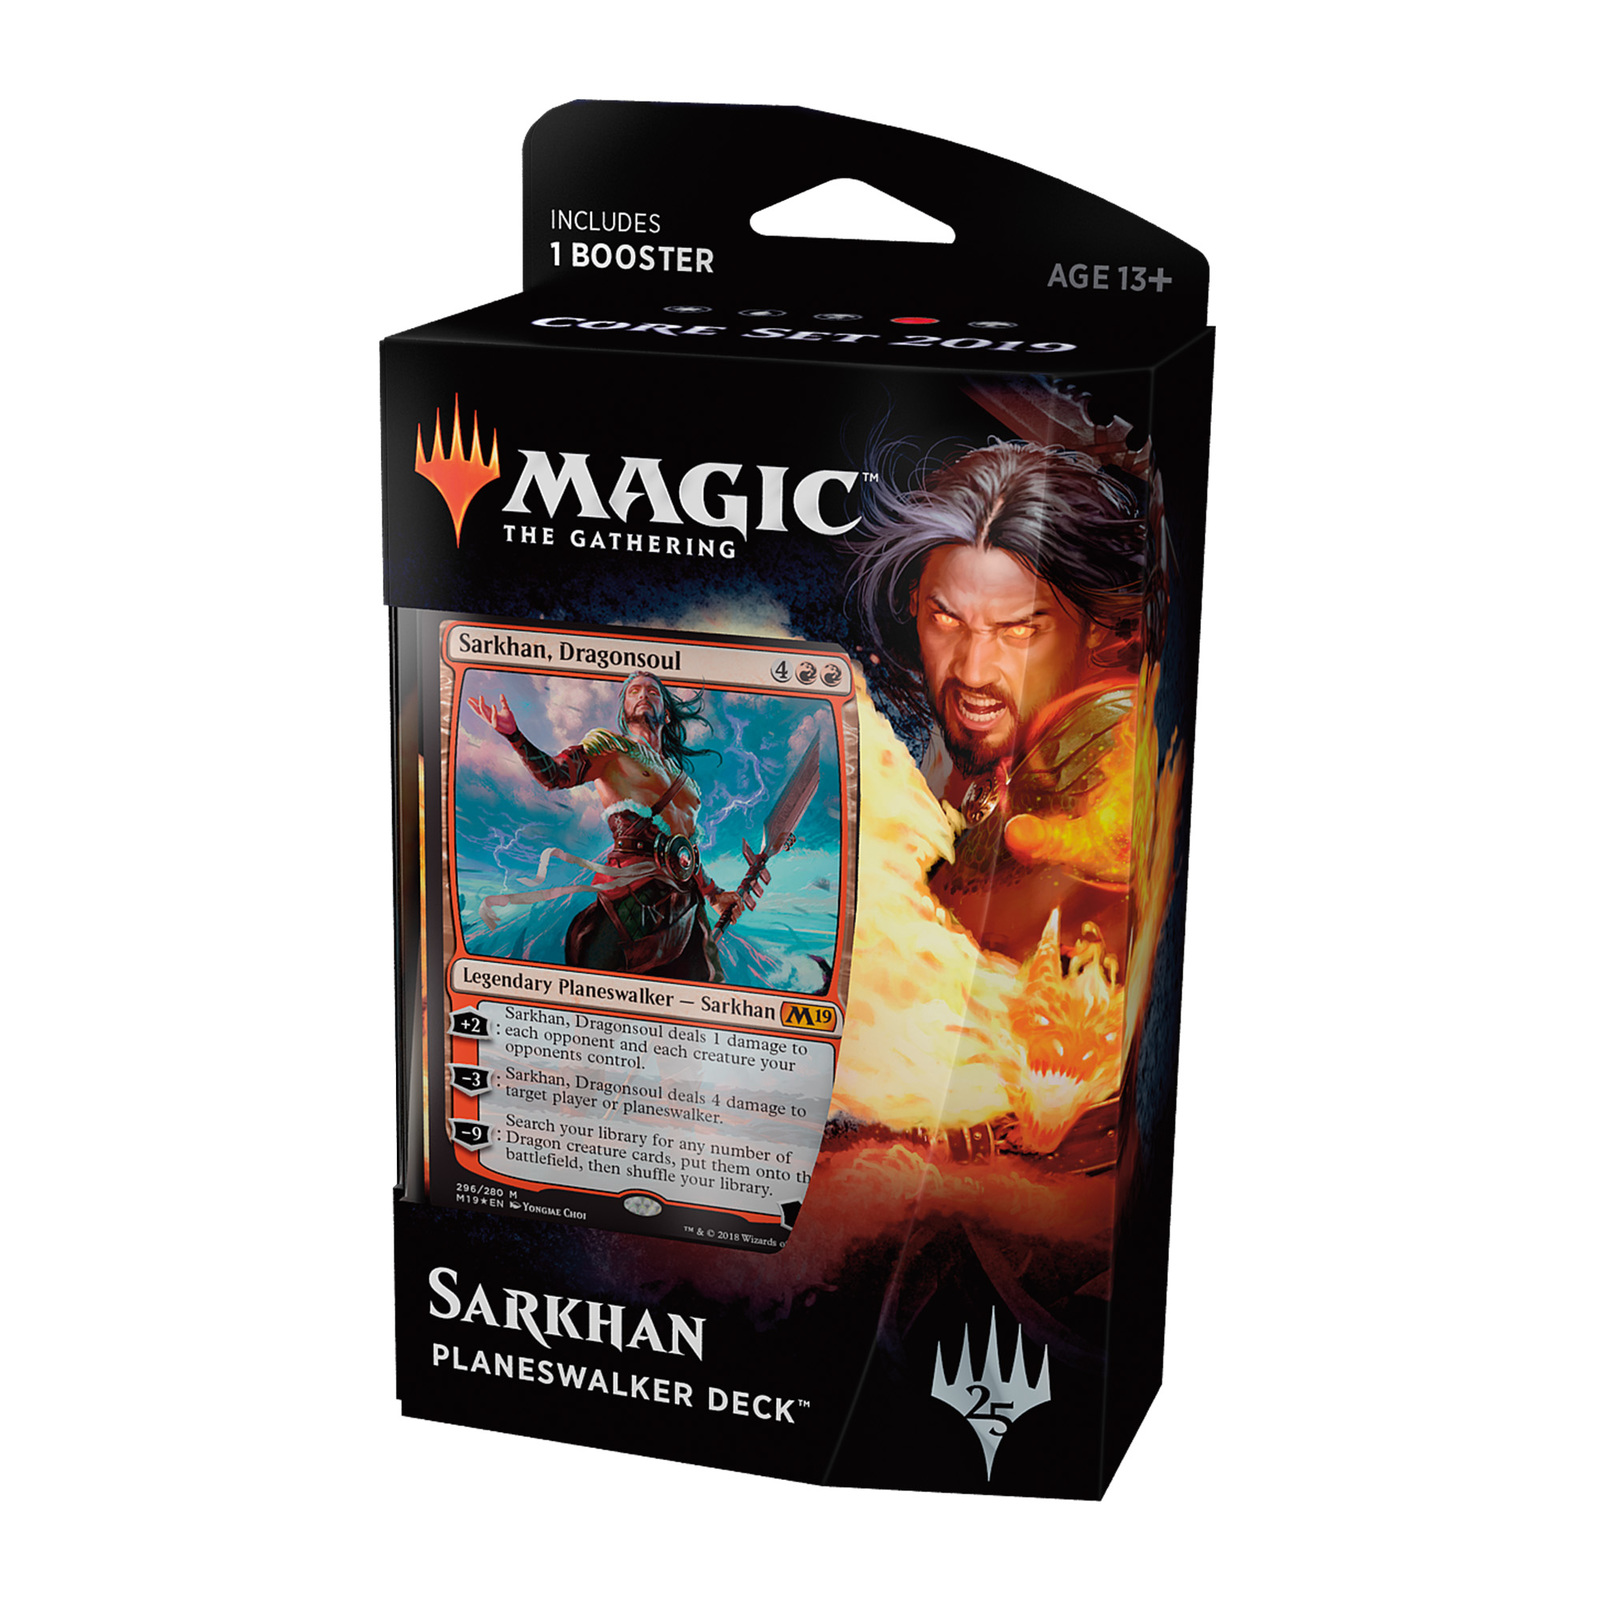 Magic The Gathering: M19 Sarkhan Planeswalker Deck image